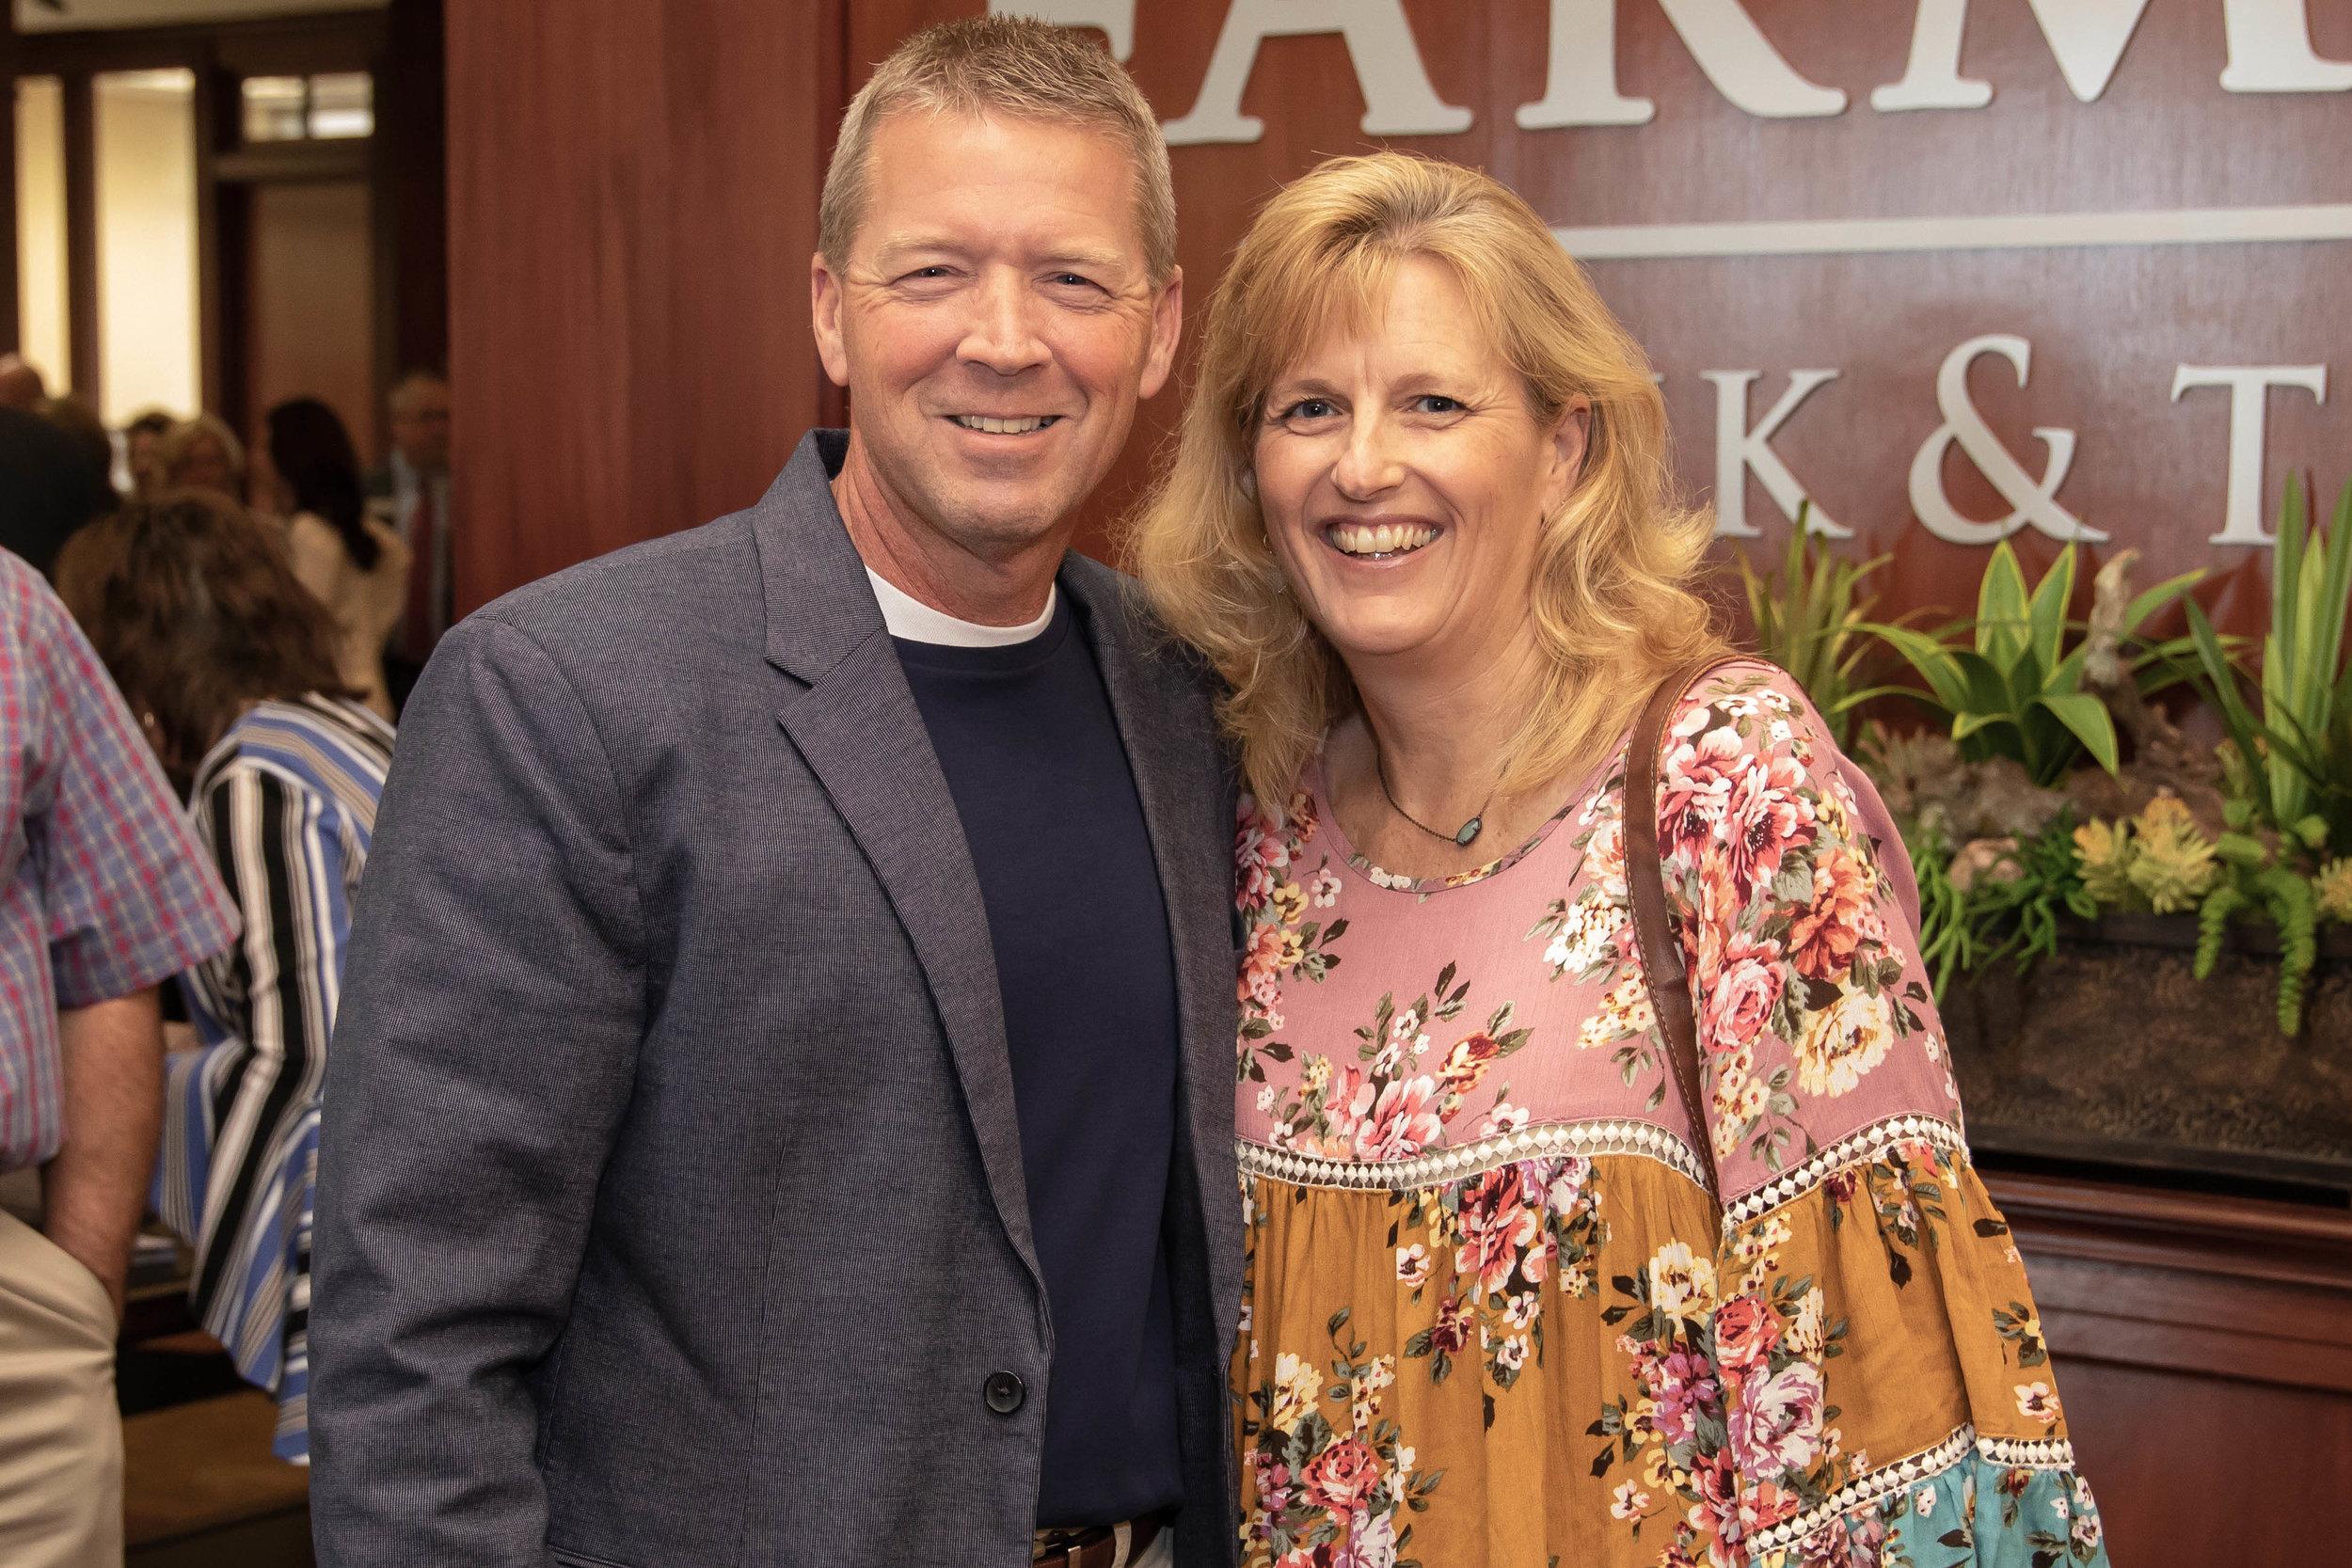 Ronnie and Traci Thompson